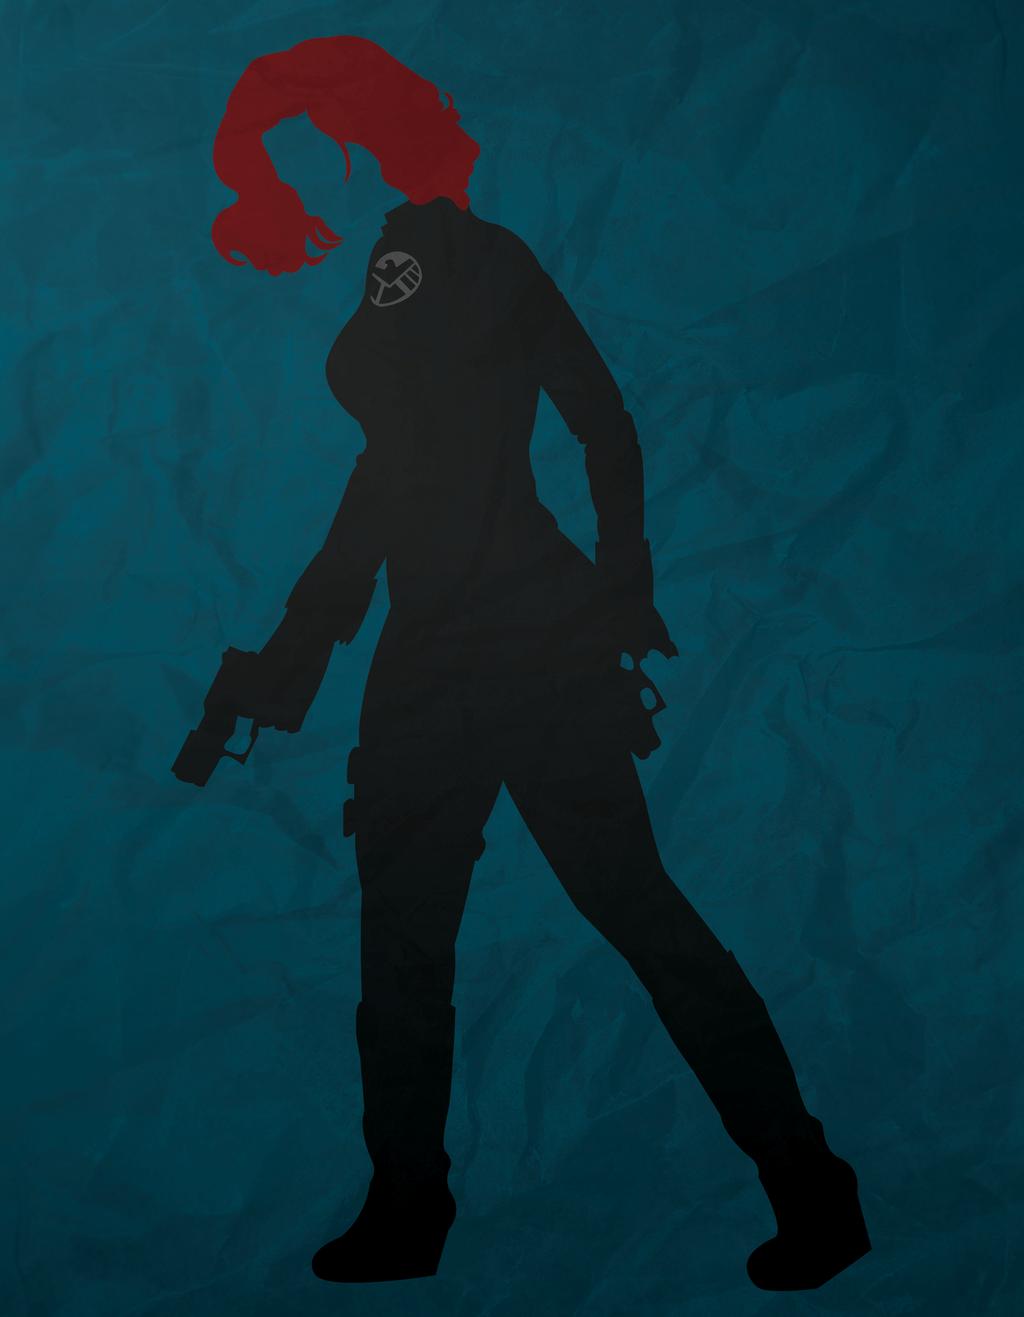 Black Widow Minimalism by AtomicKittenStudios on DeviantArt